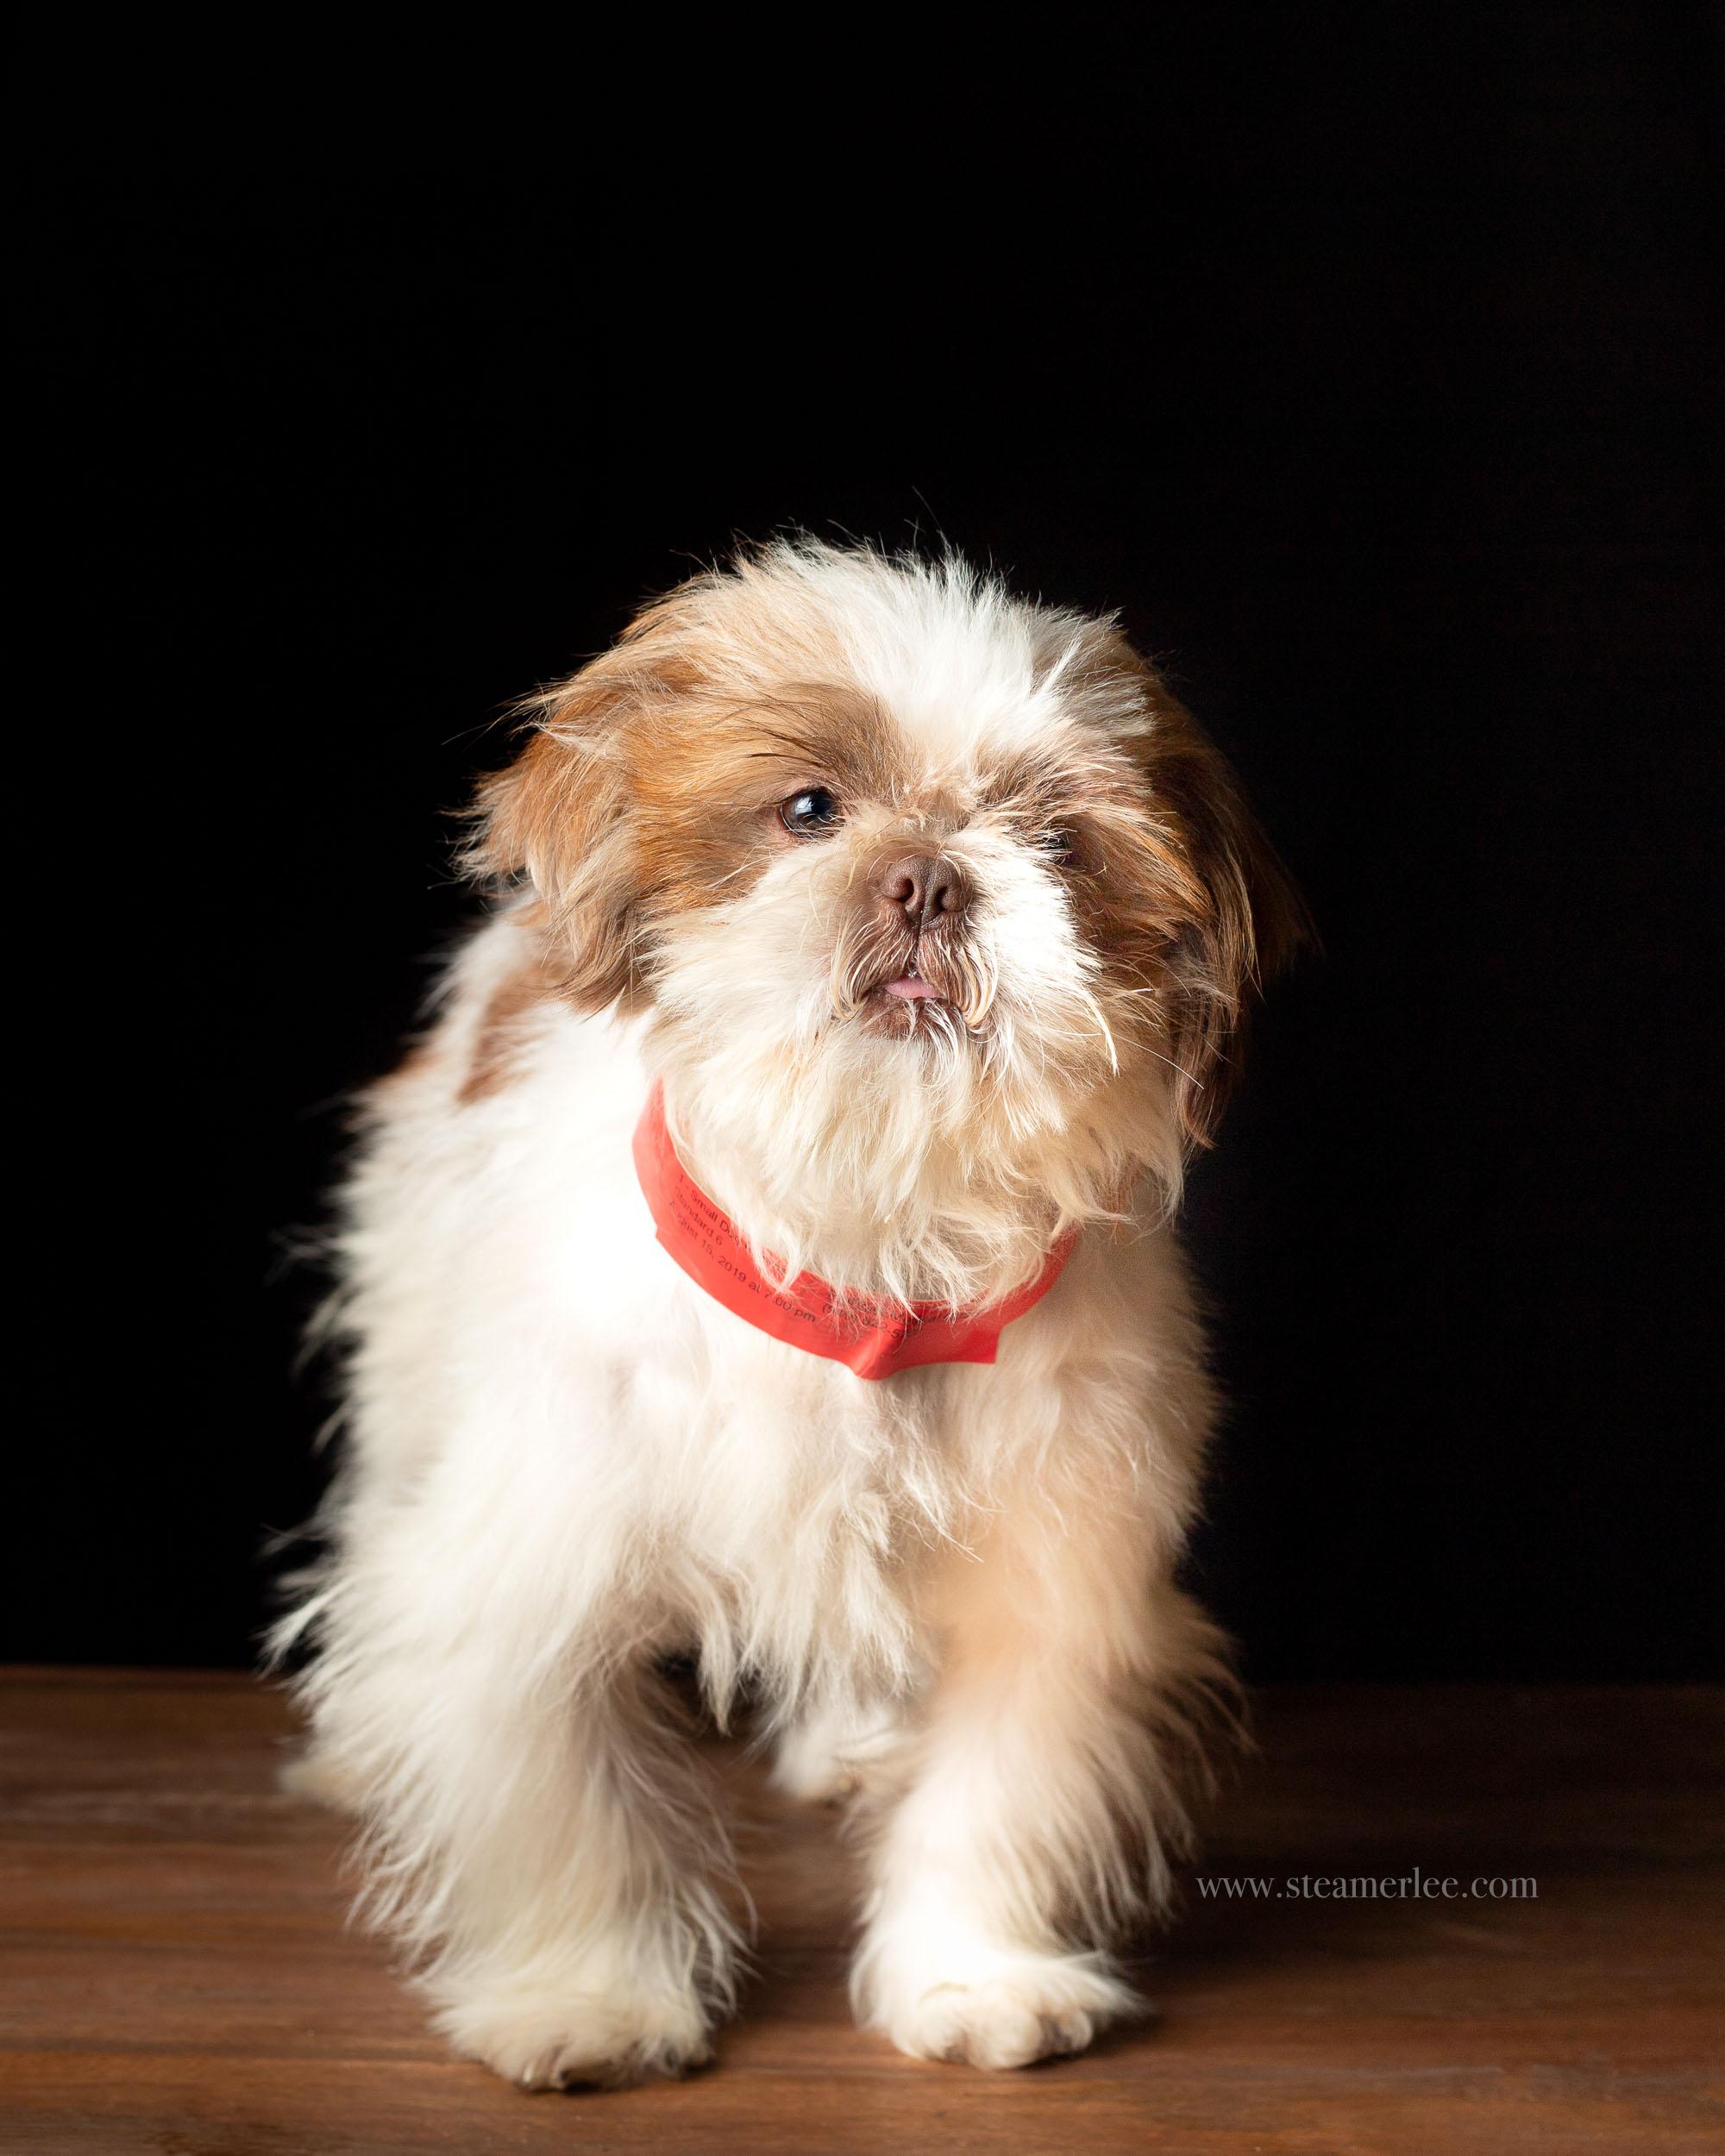 Gus-Shih-Tzu-Orange-County-Dog-Photography-by-Steamer-Lee-003.JPG